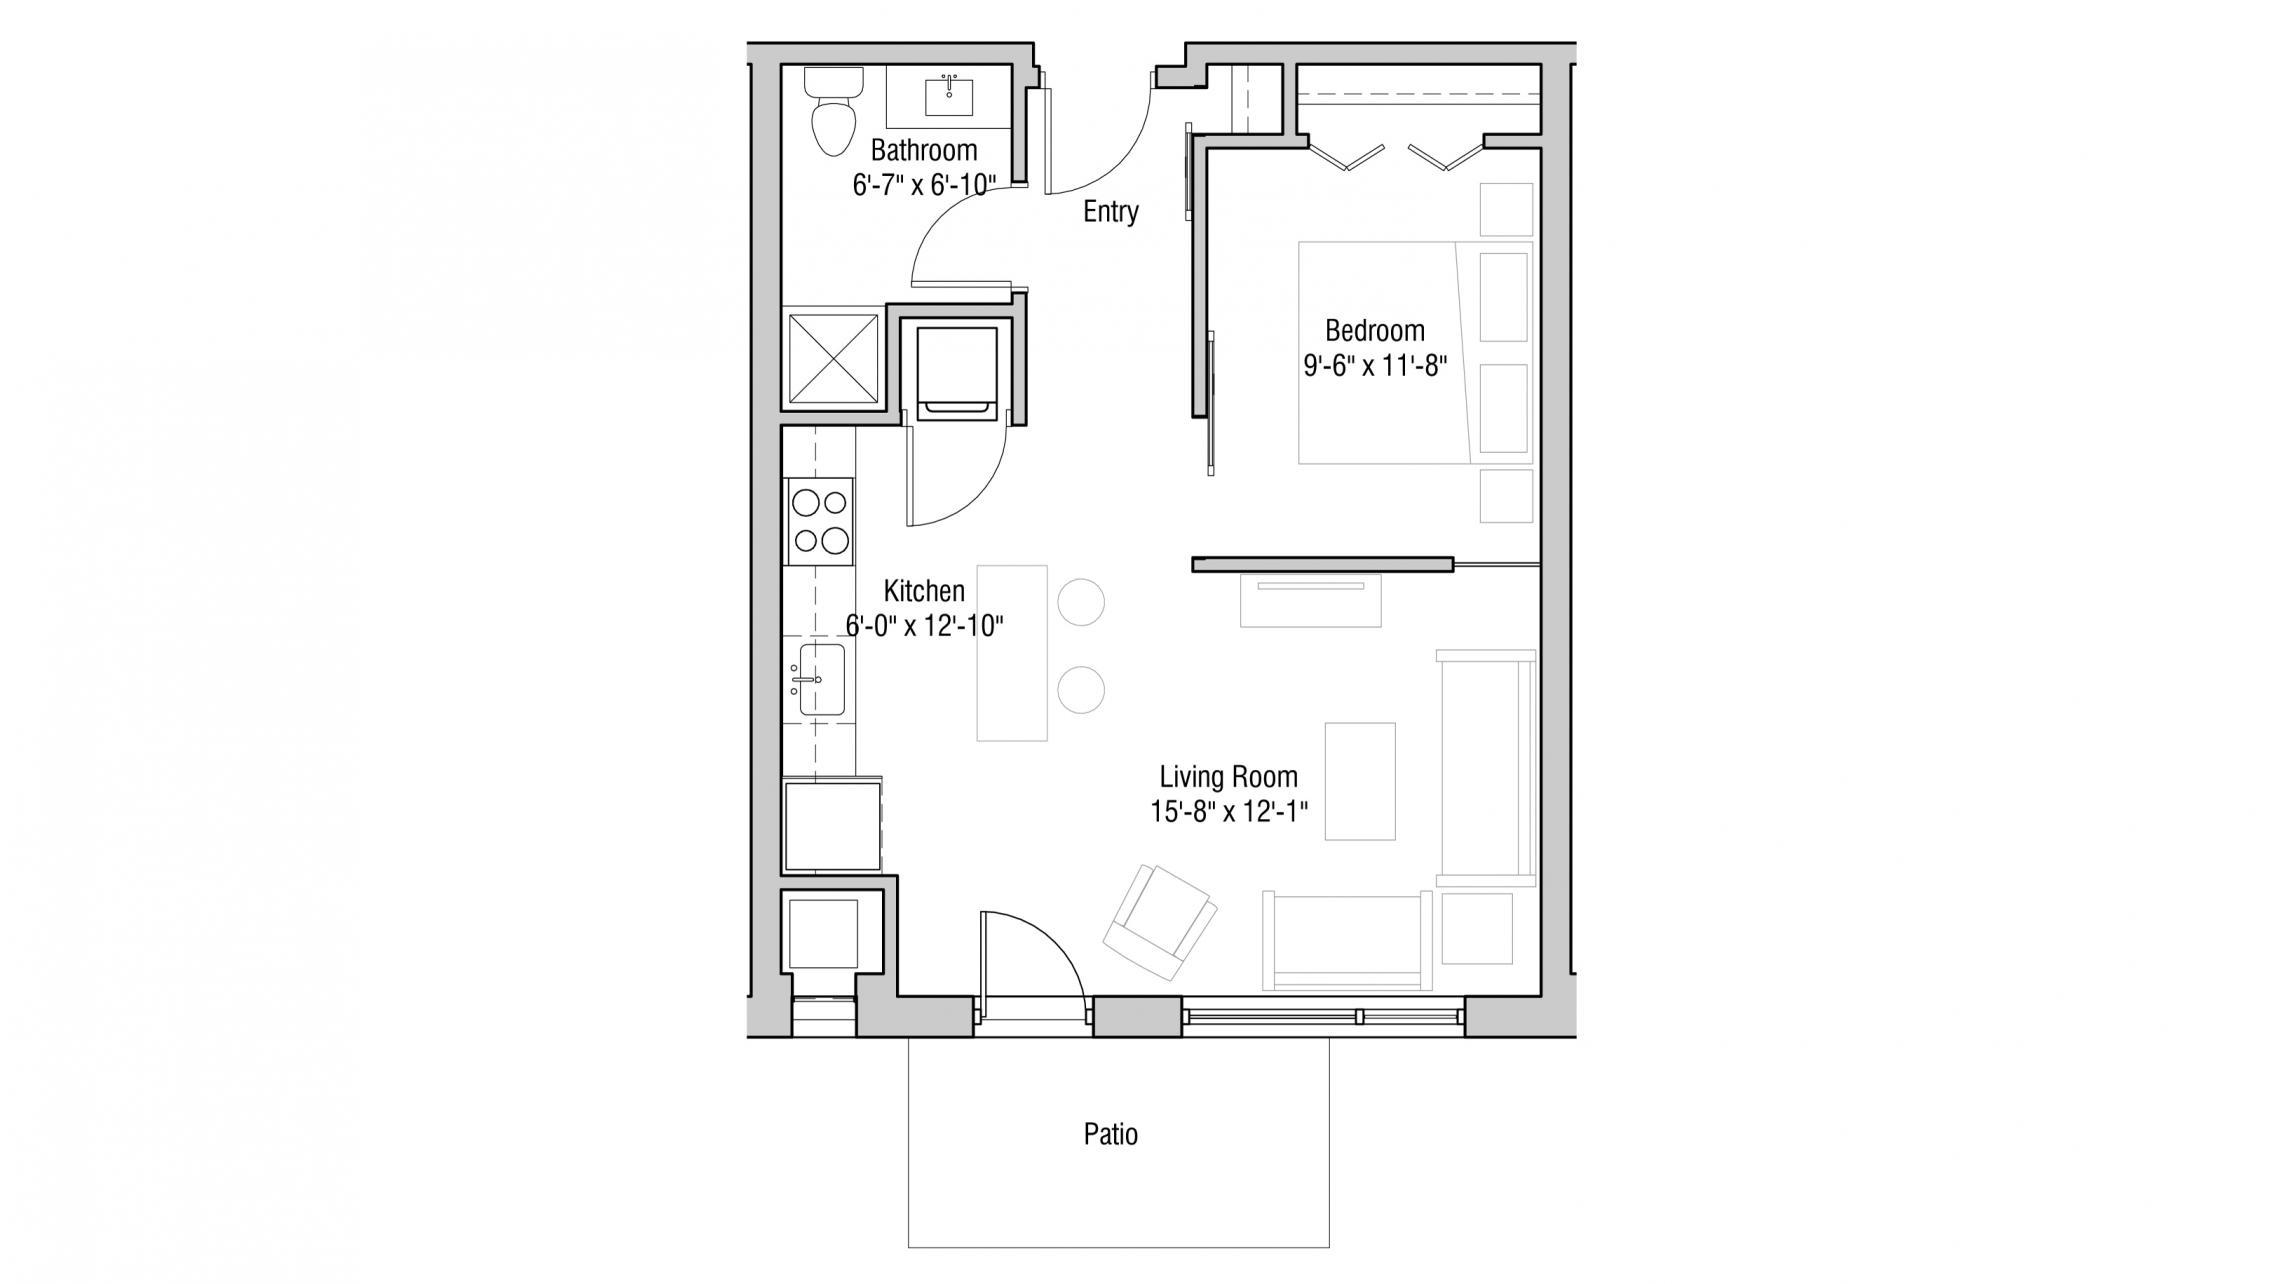 ULI Quarter Row 109 - One Bedroom, One Bathroom